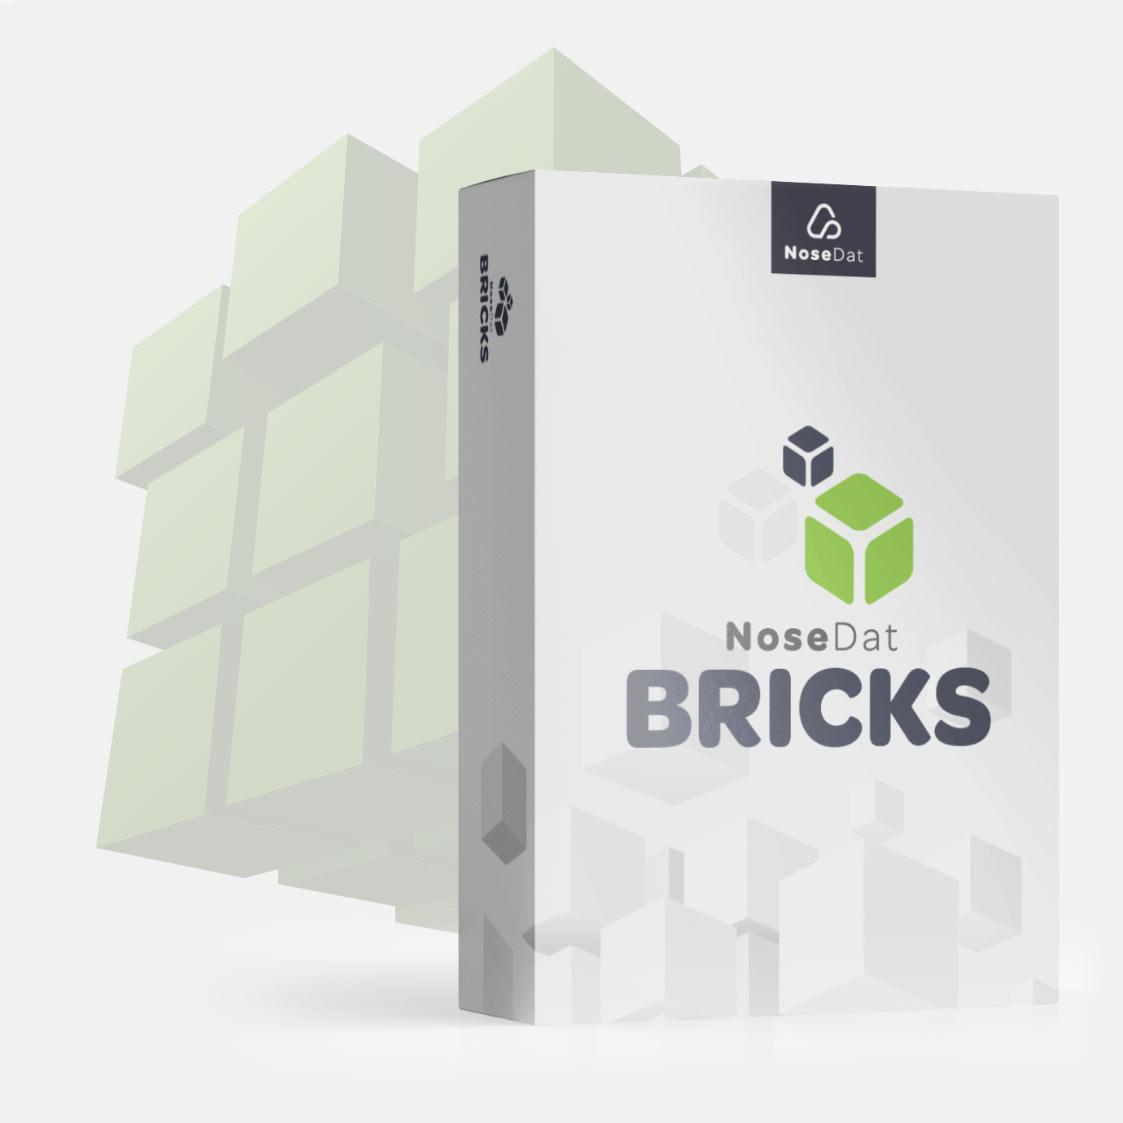 NoseDat Bricks